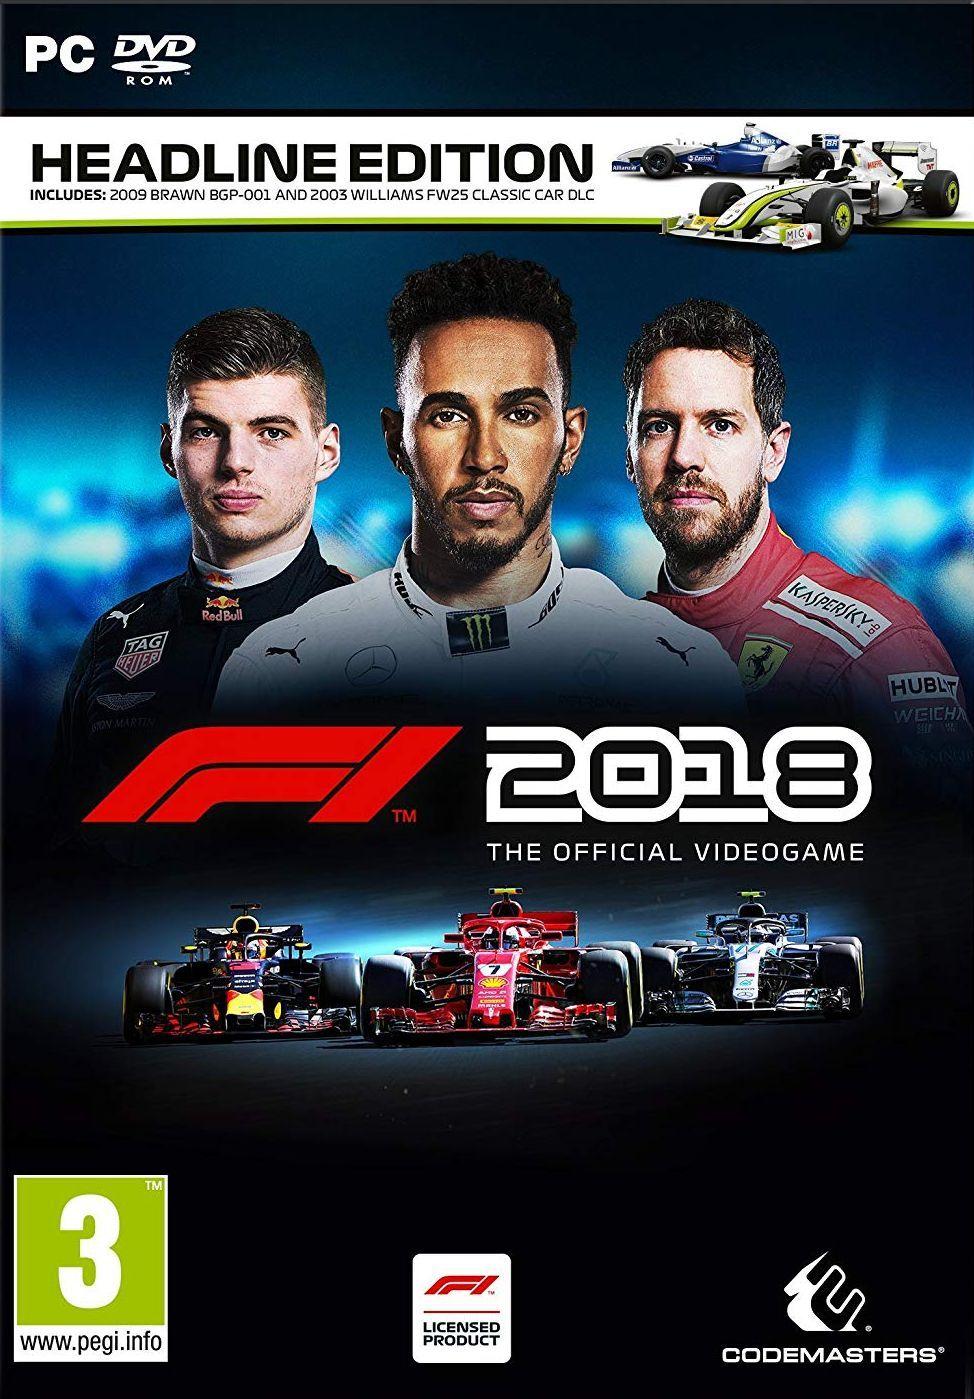 F1 2018 Headline Edition (PC) - 1